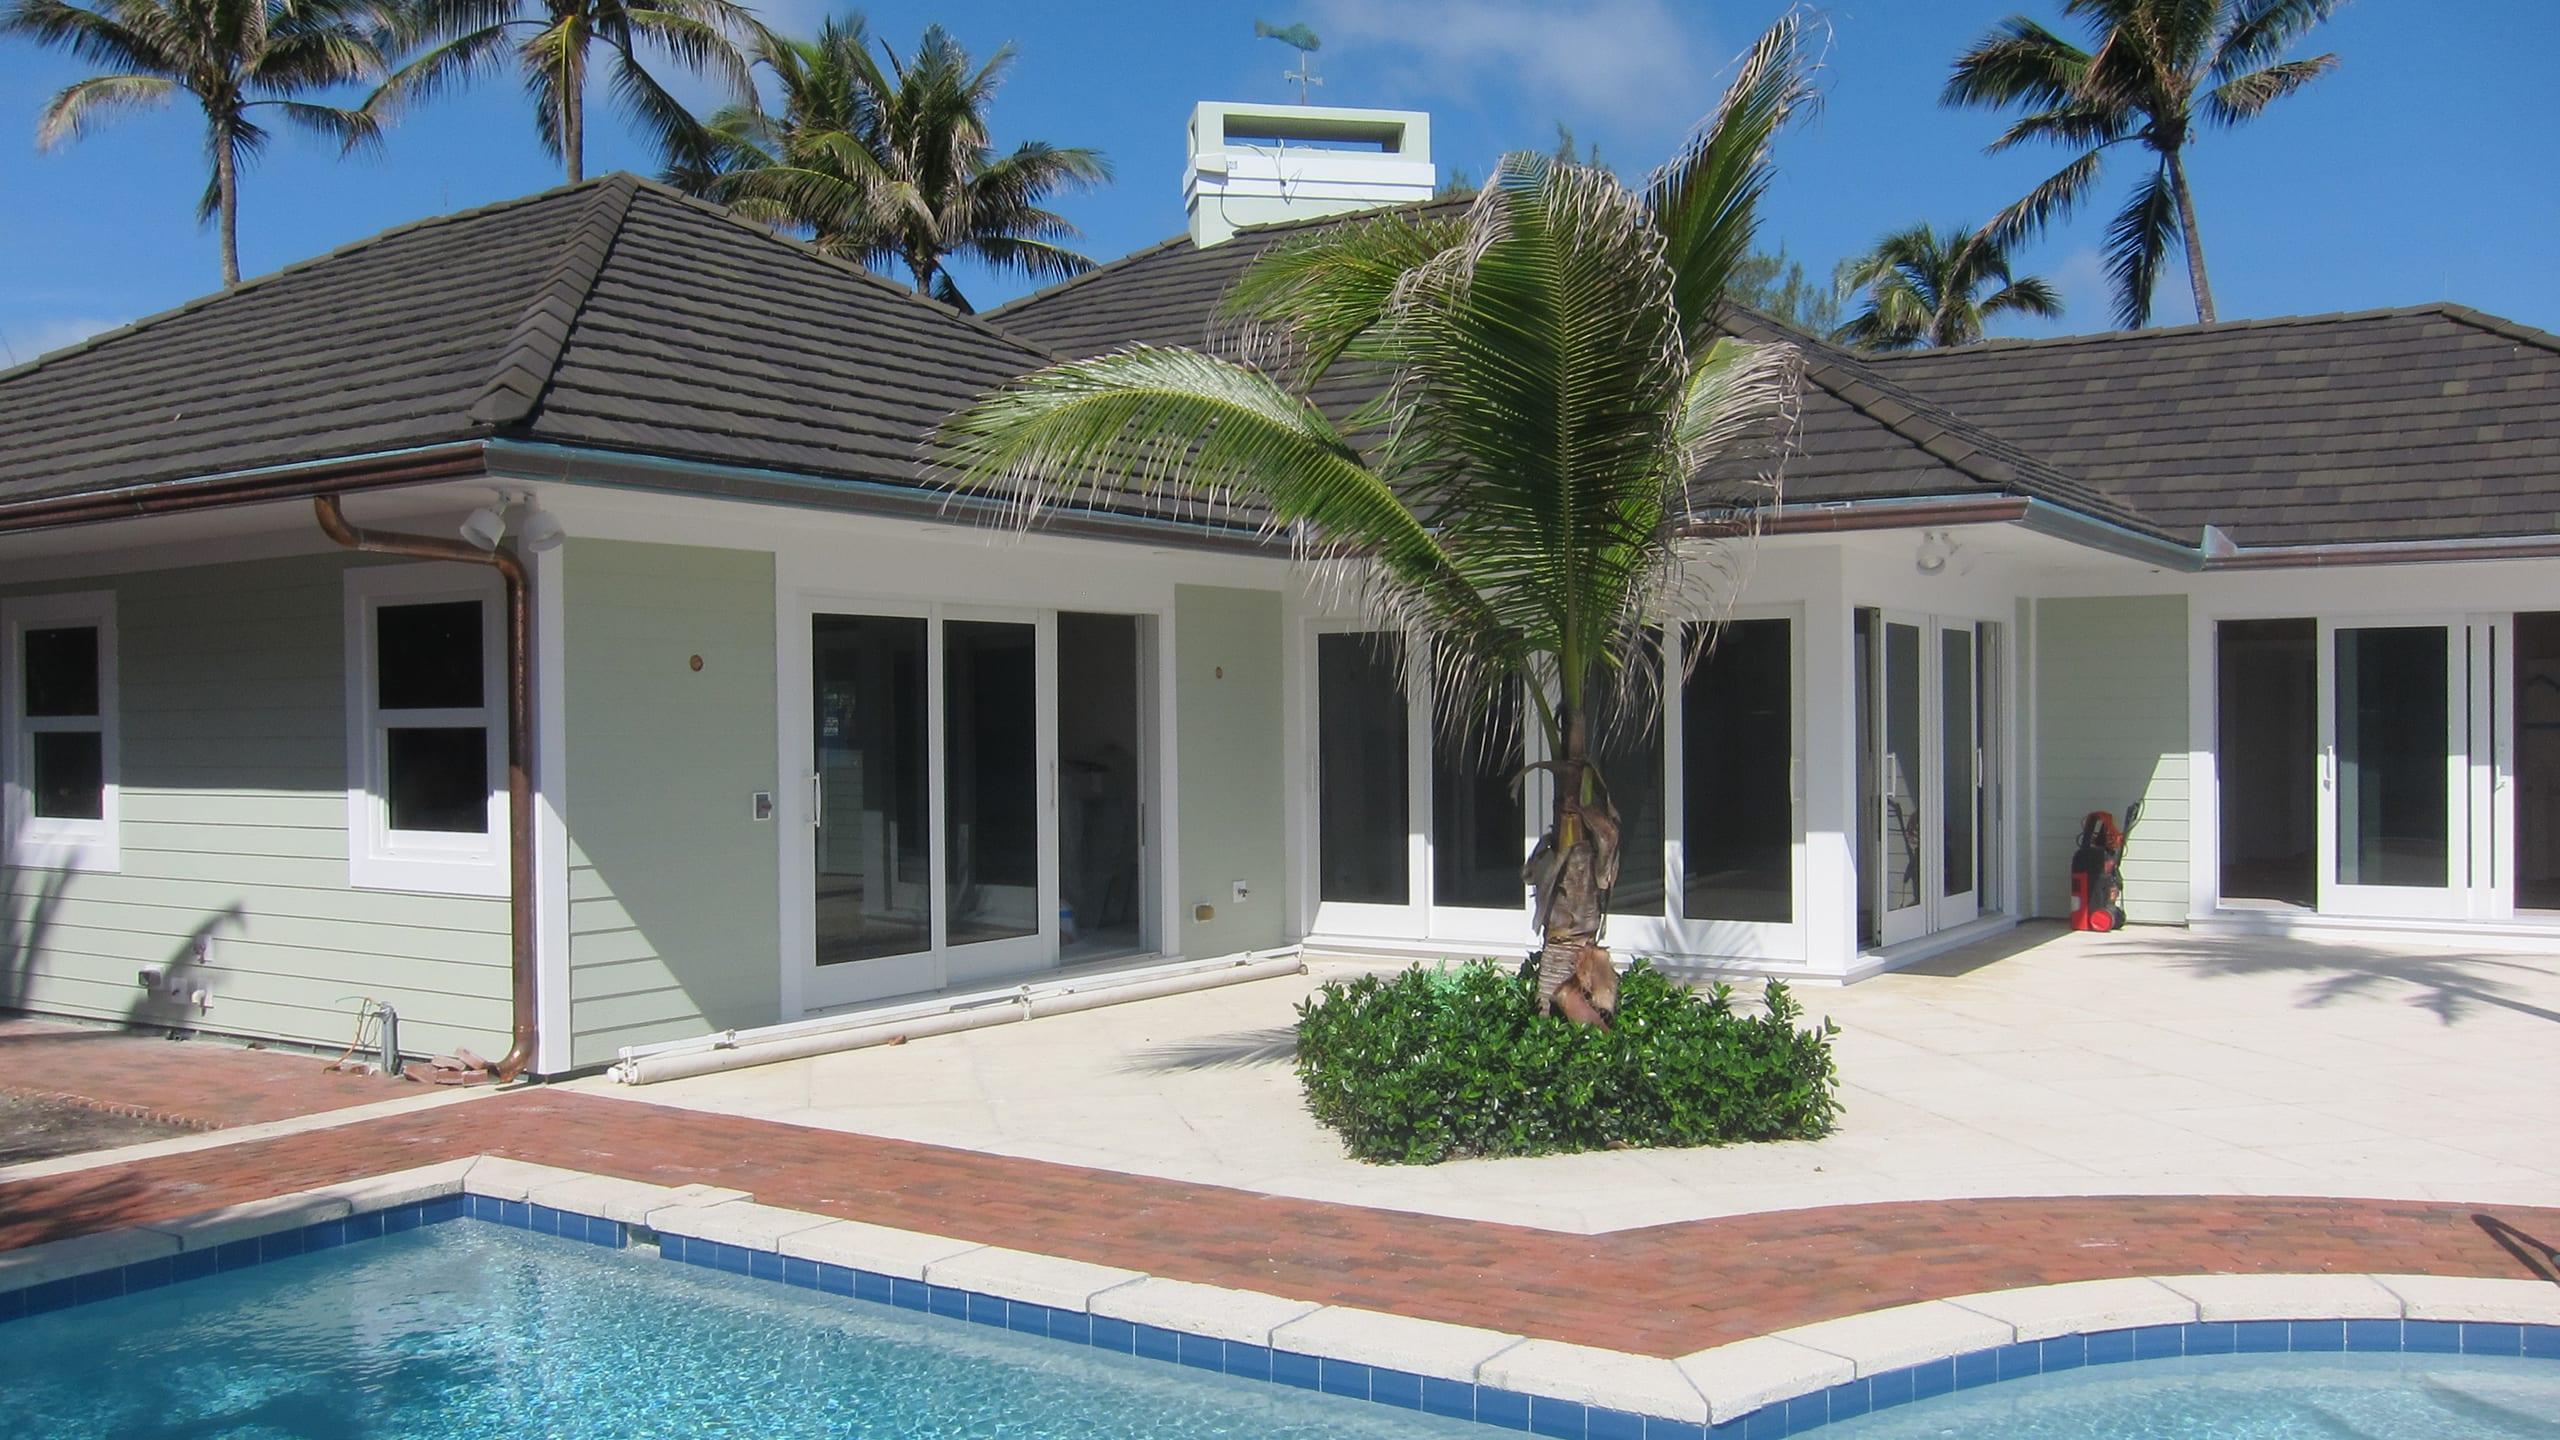 Private Residence - Jupiter Ludowici Roof Tile